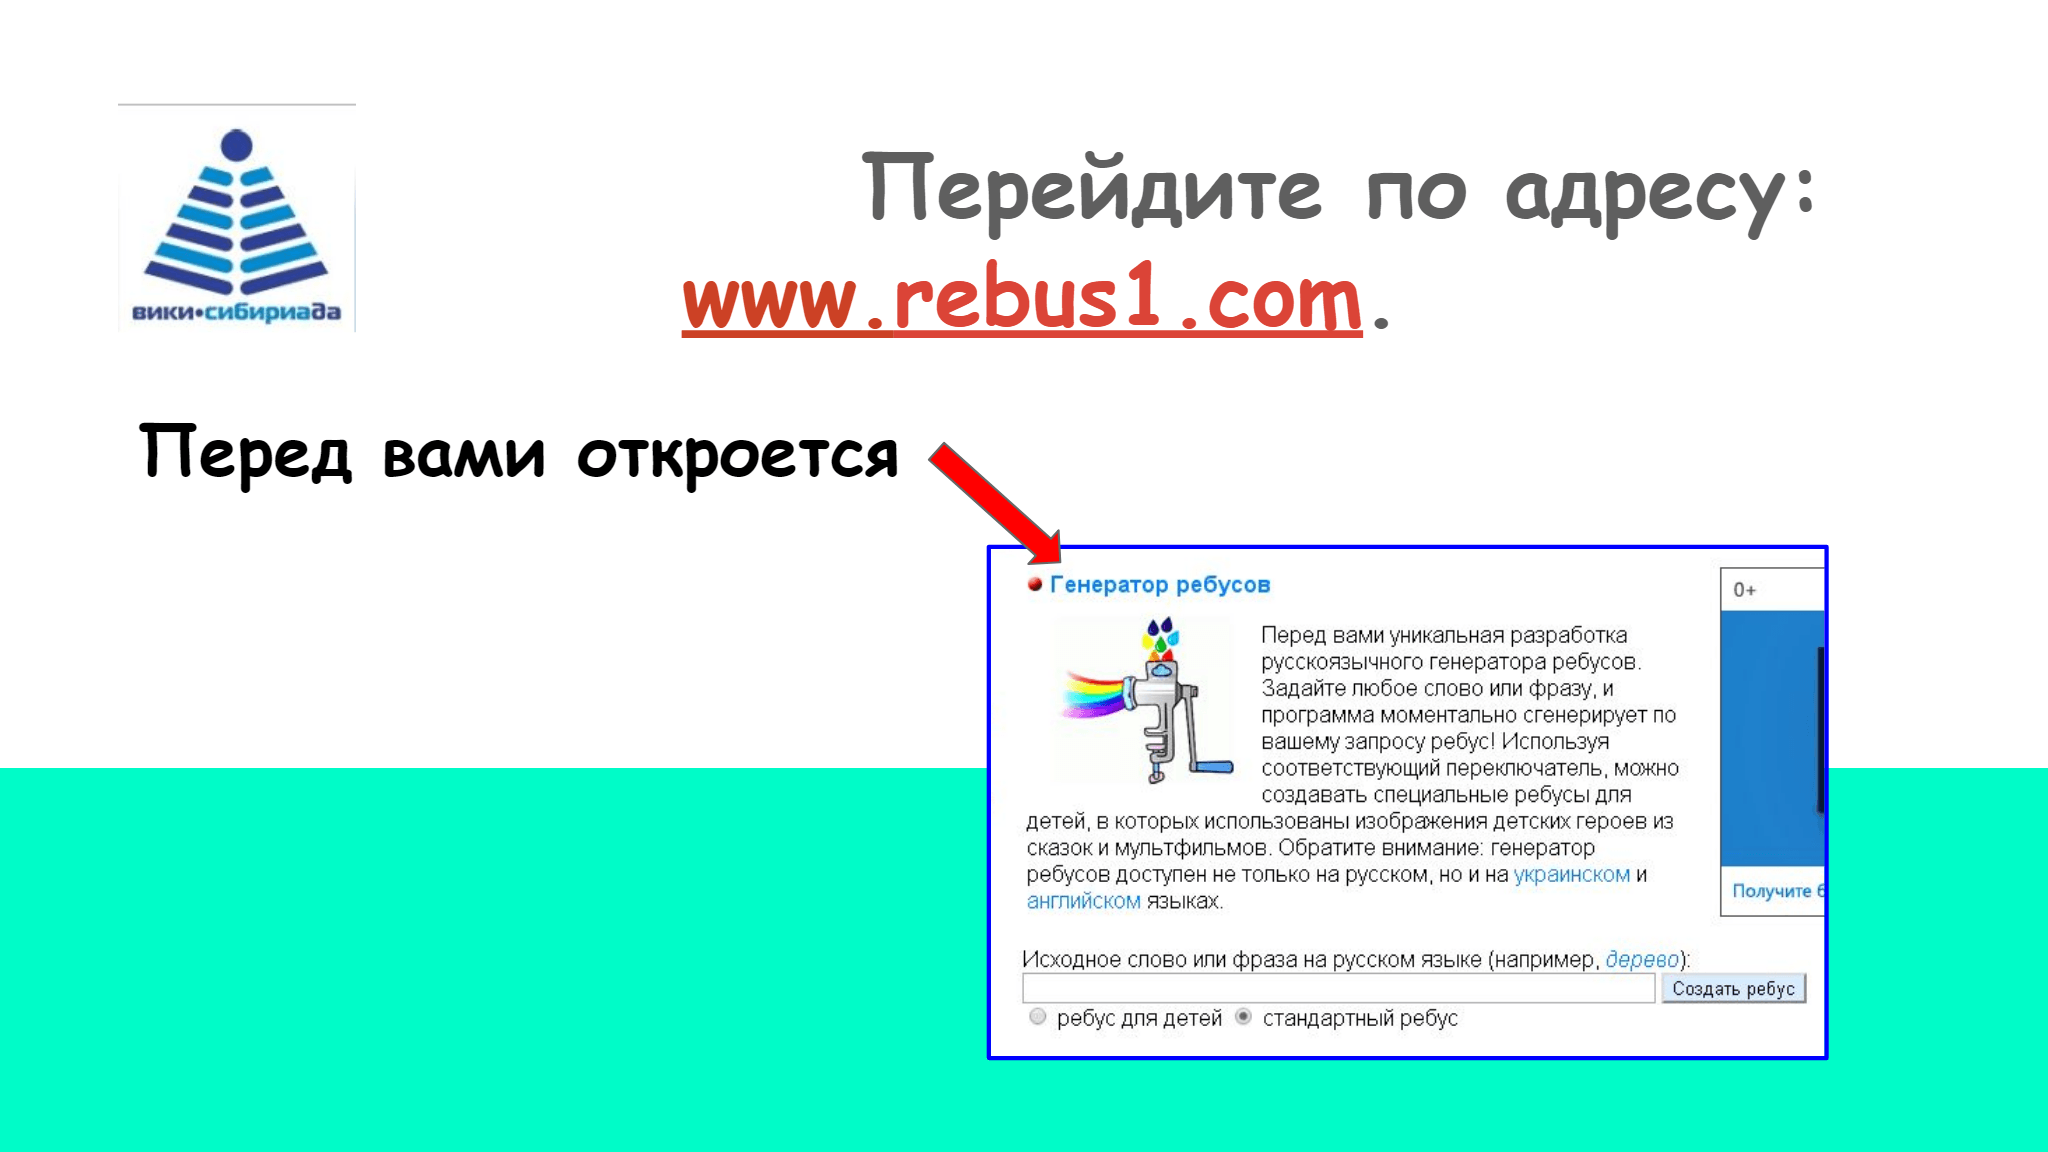 Перейдите по адресу:  www. rebus1.com .          Перед вами откроется